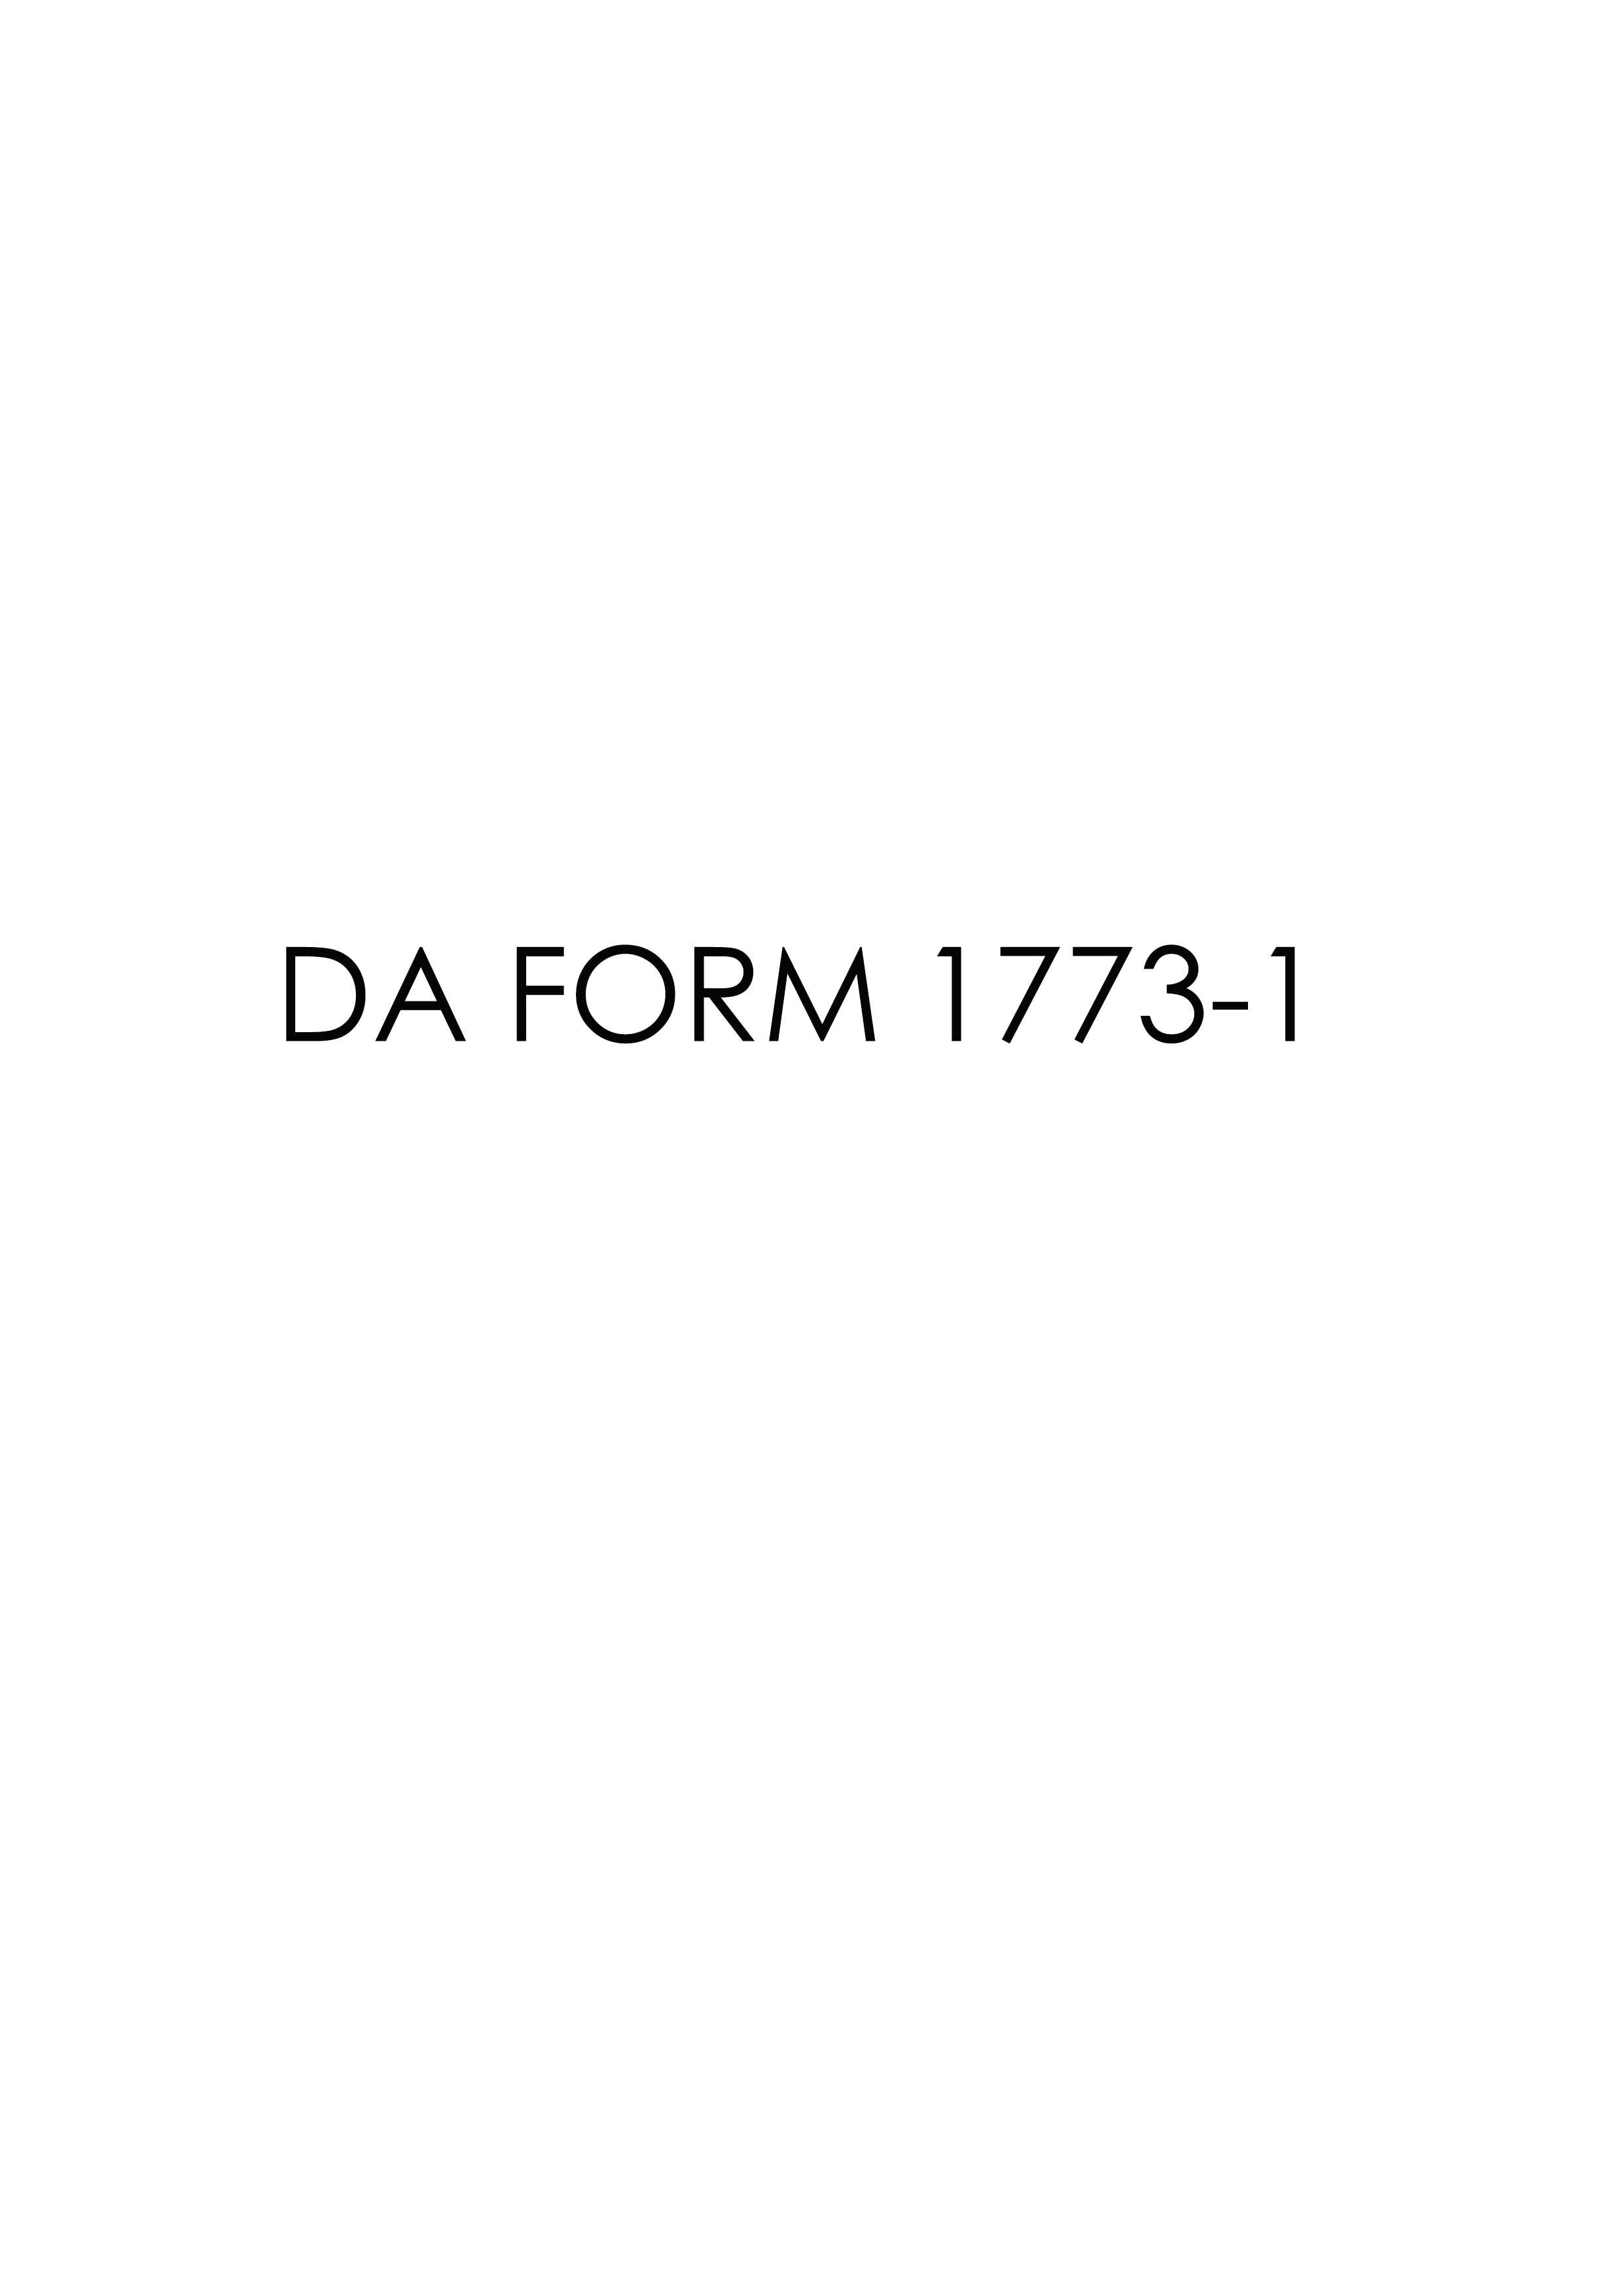 Download da Form 1773-1 Free